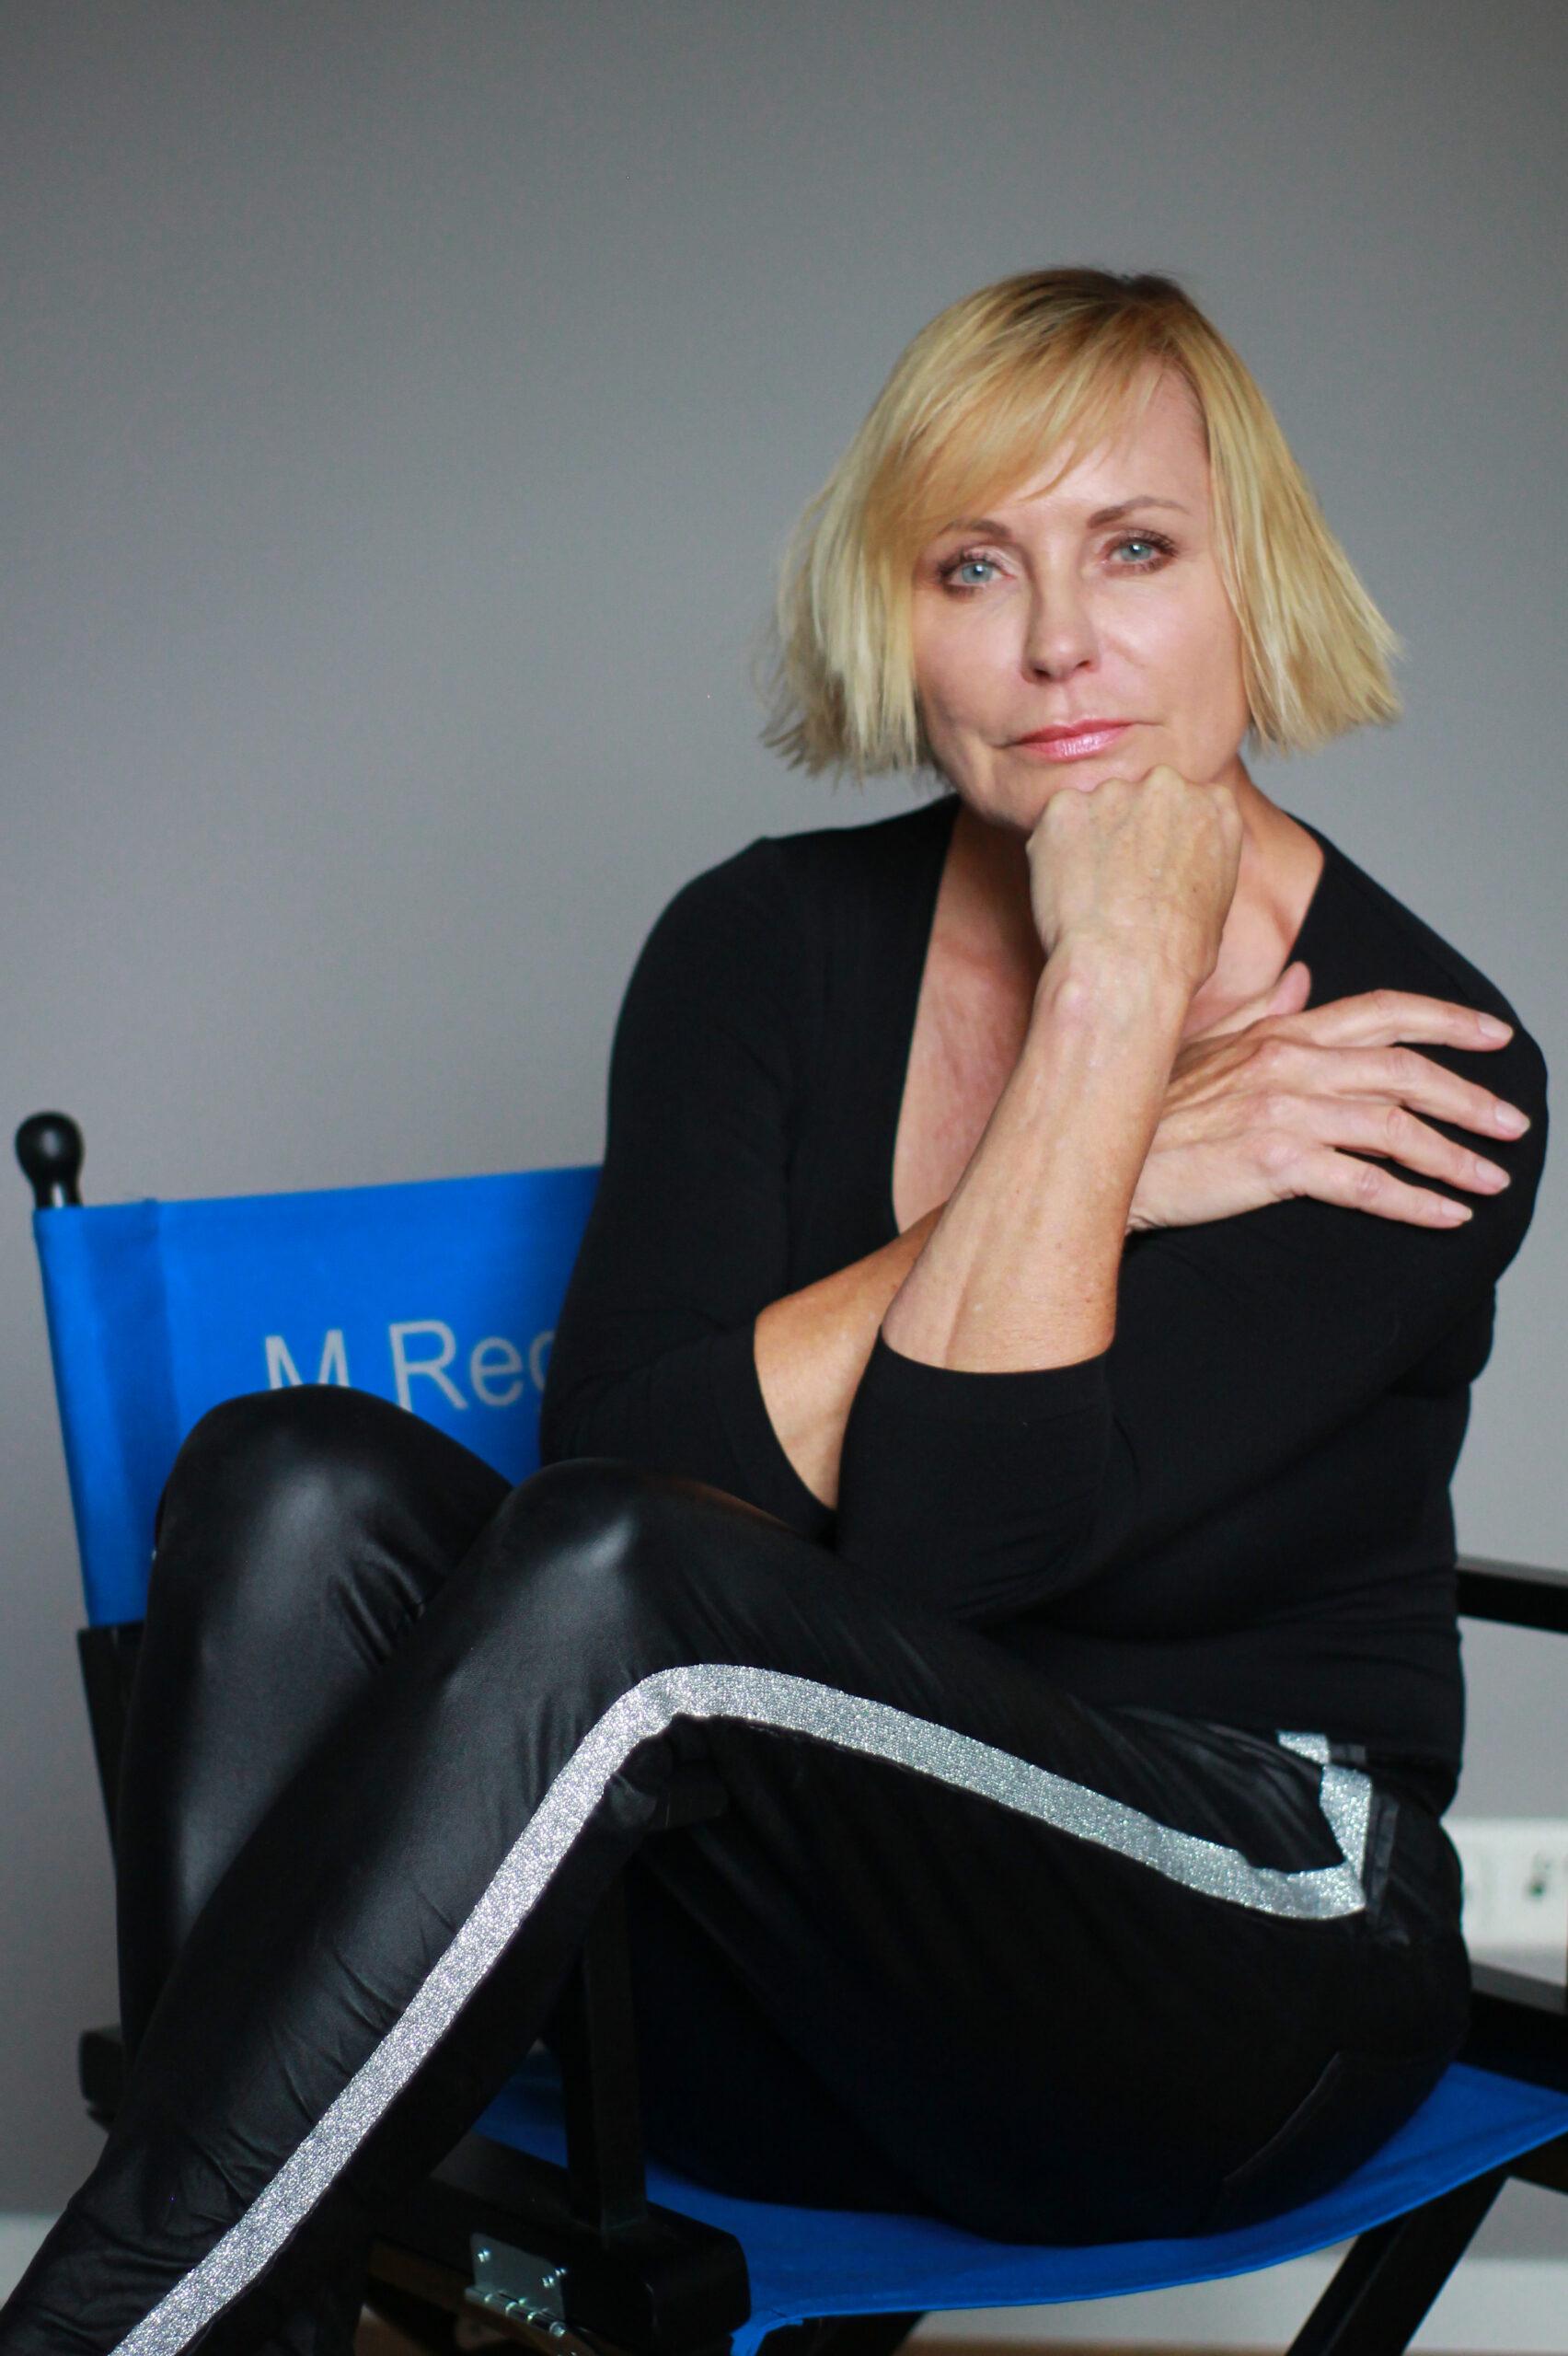 Martina Dieckmann